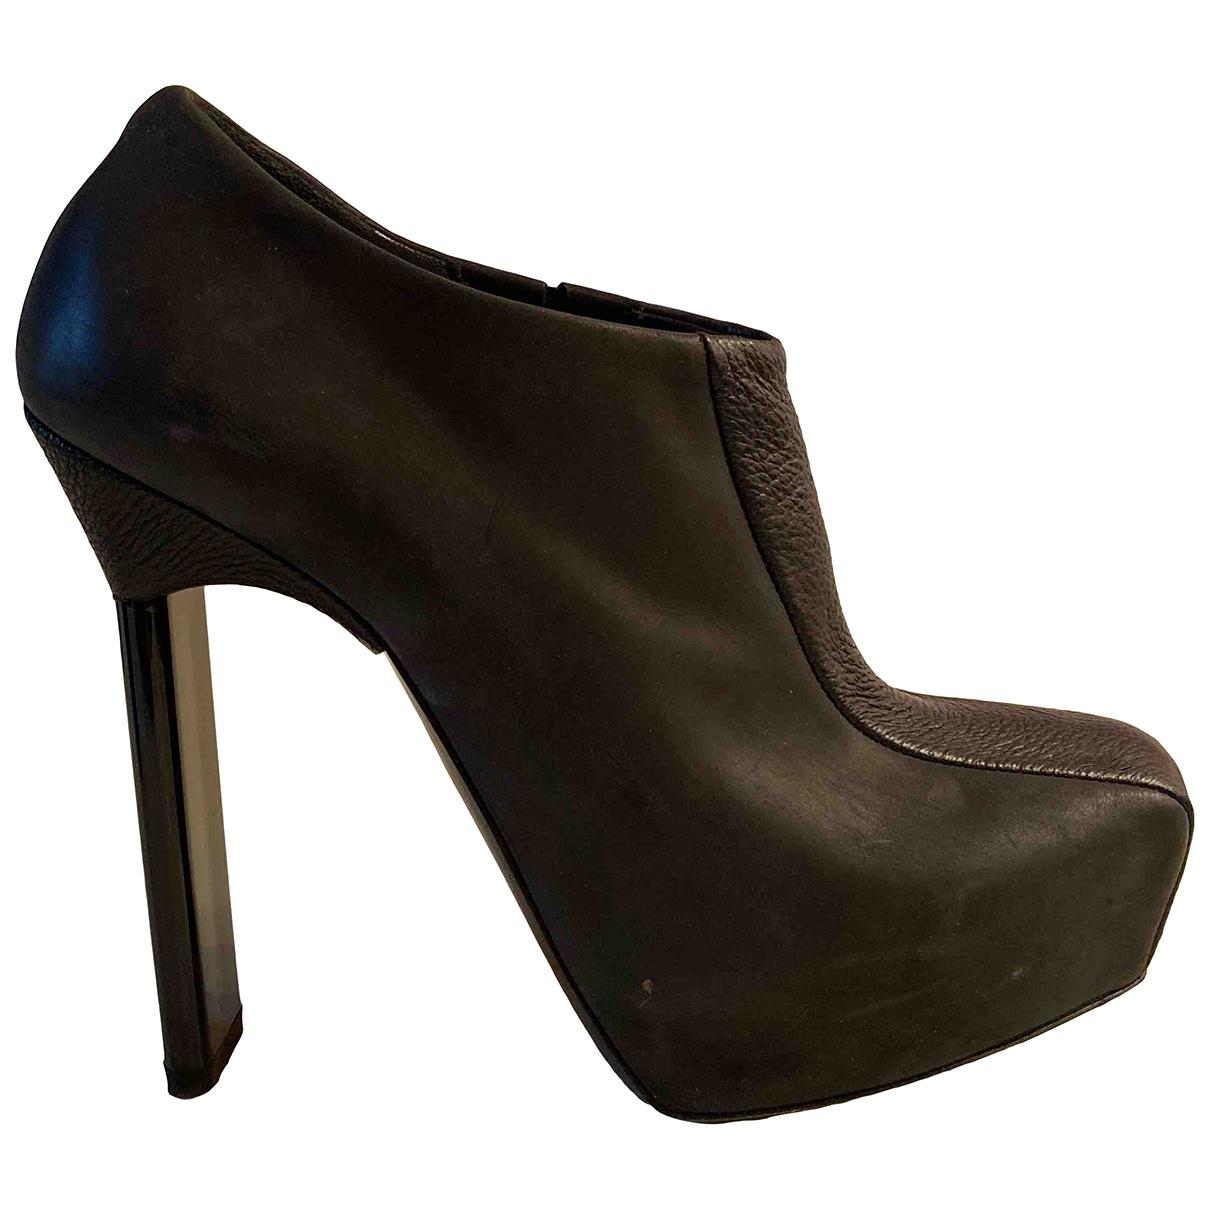 Balenciaga - Boots   pour femme en cuir - noir